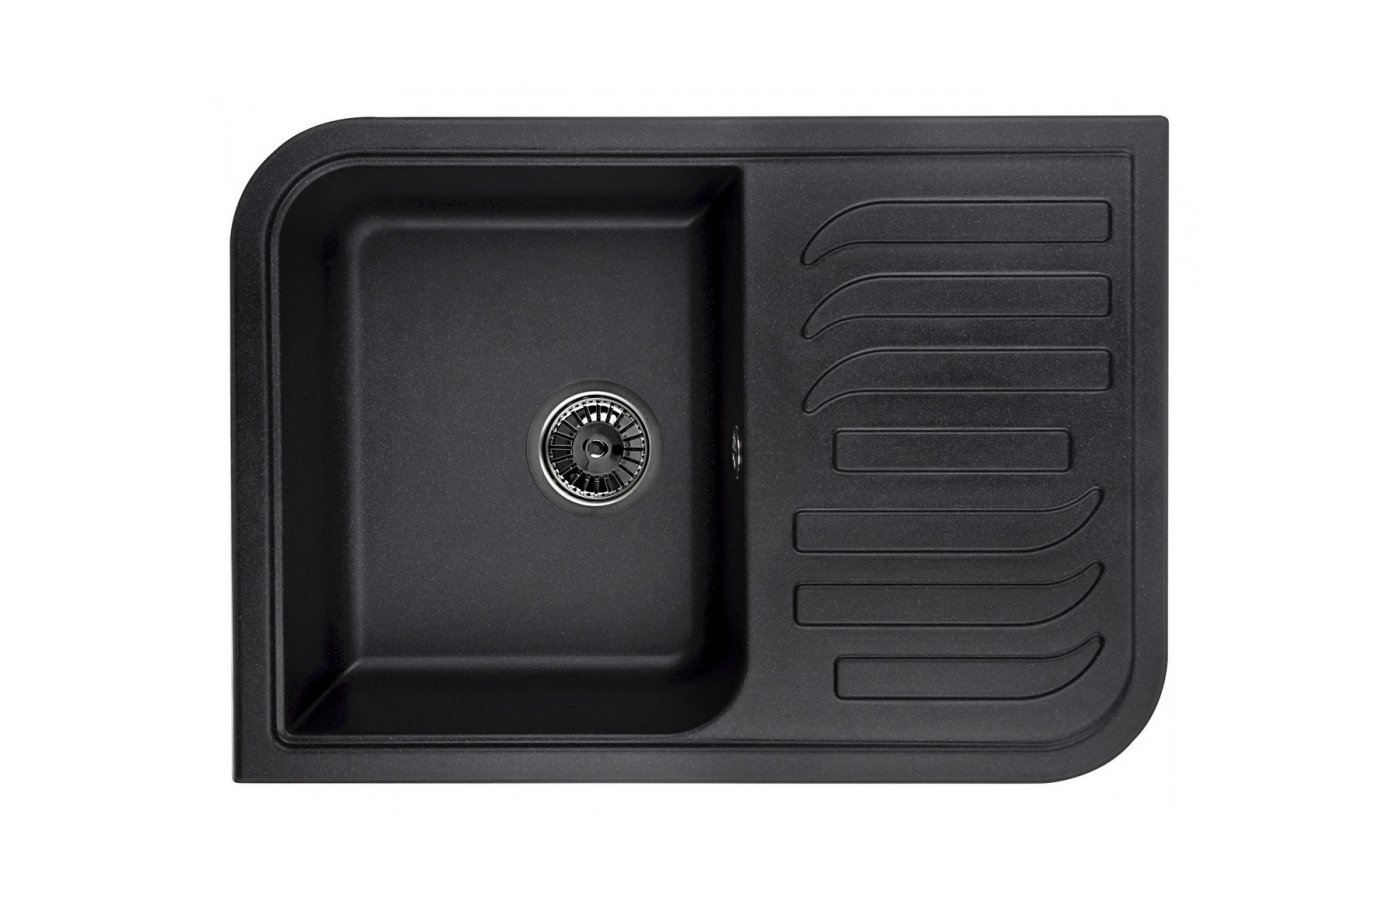 Кухонная мойка Weissgauff SOFTLINE 695 Eco Granit бежевый